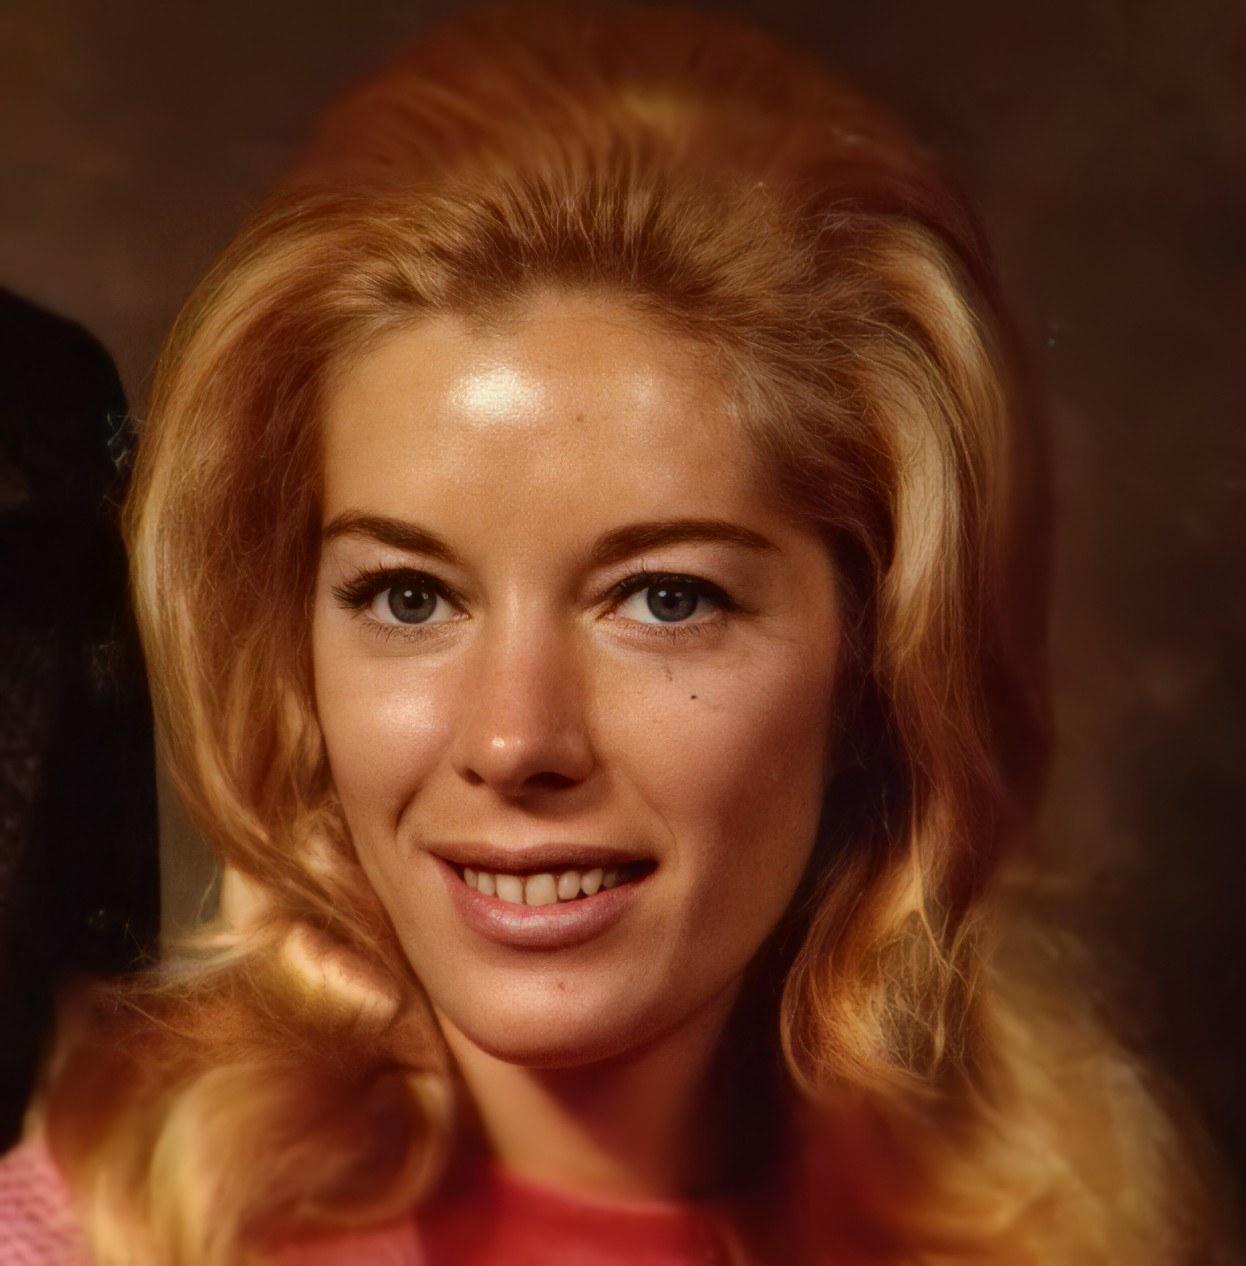 Cindy James